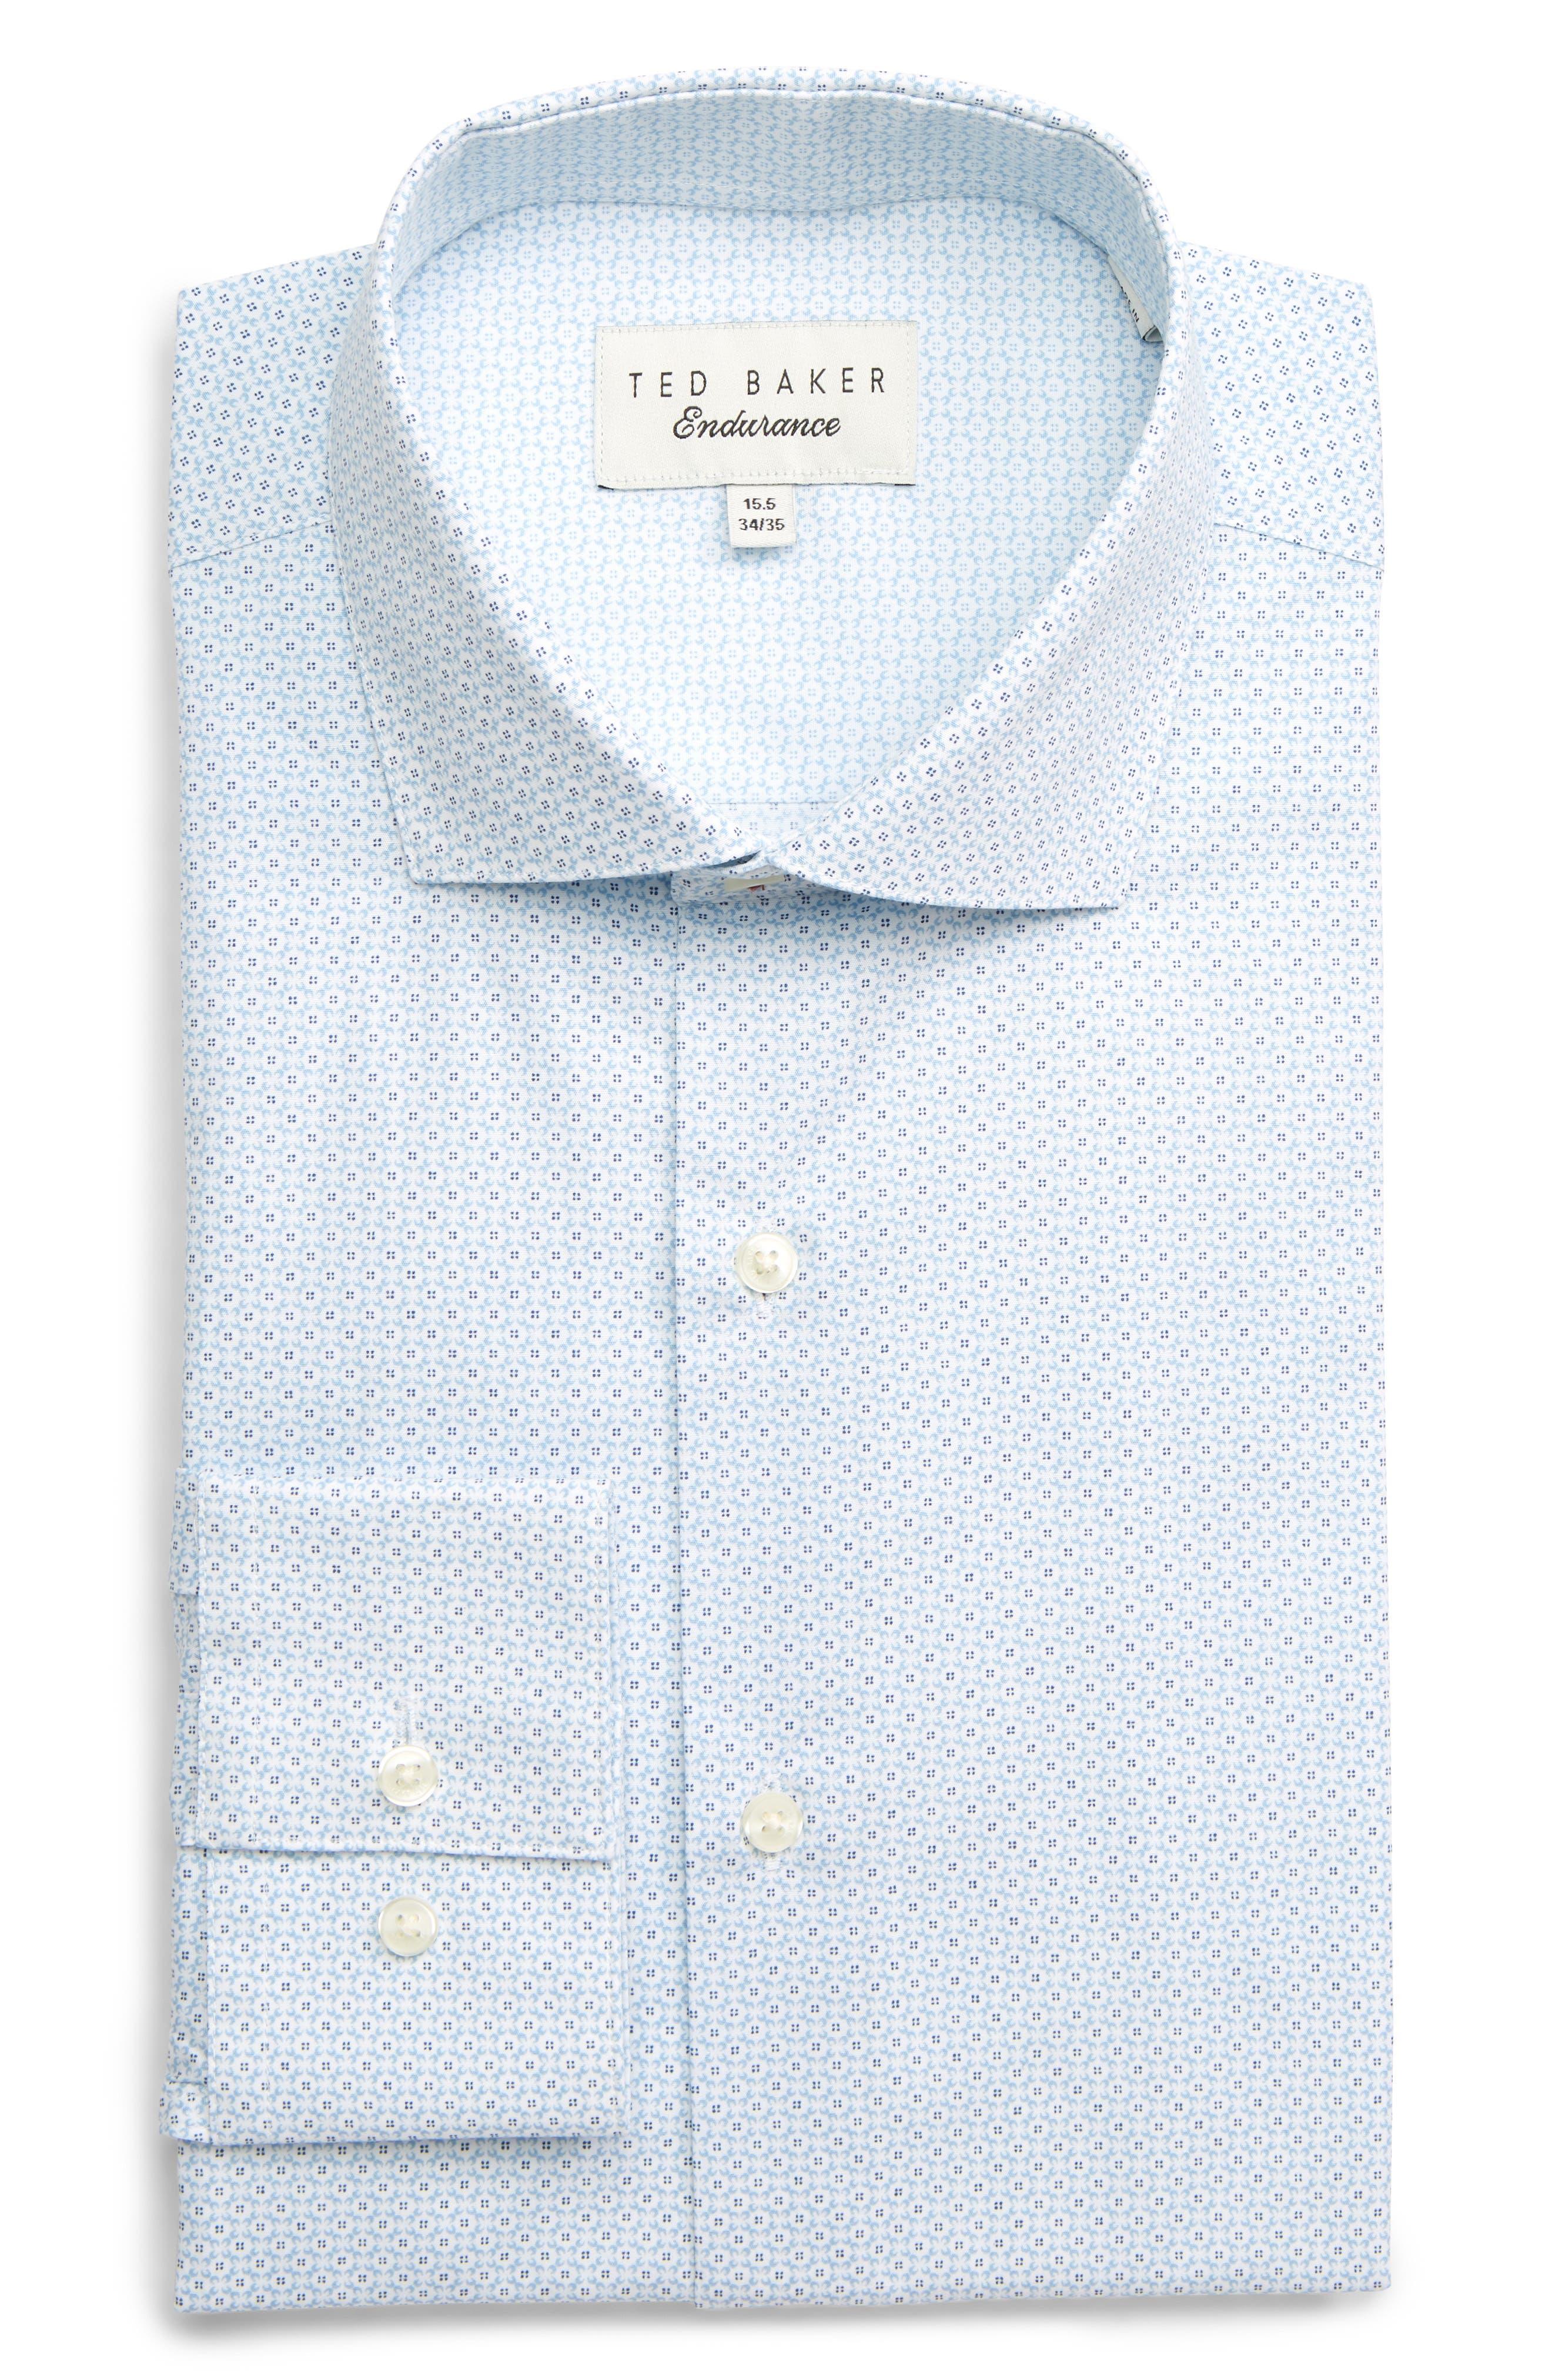 TED BAKER LONDON Endurance Wobego Slim Fit Geometric Dress Shirt, Main, color, BLUE